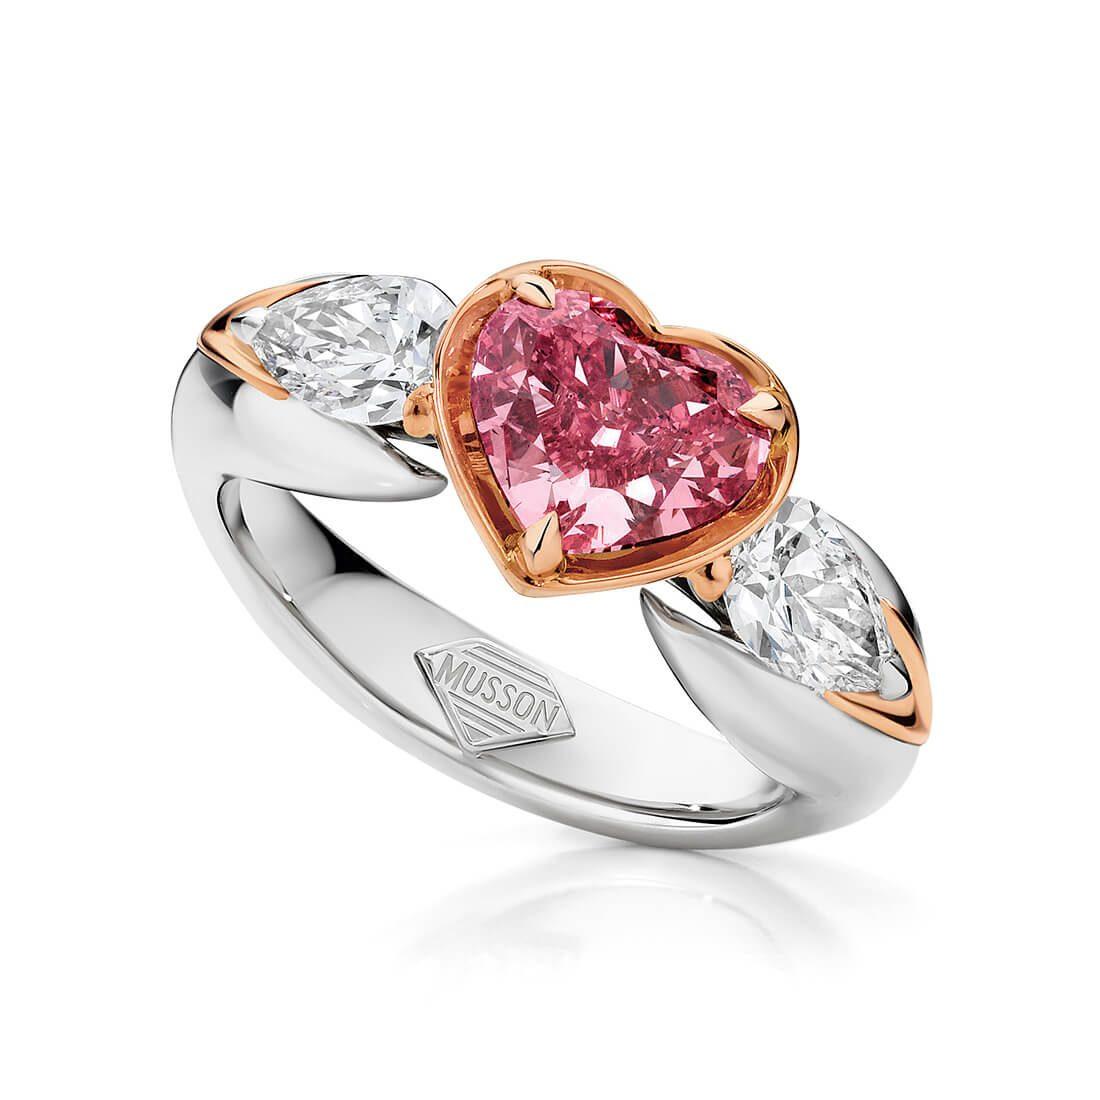 Mon Coeur Ring, Argyle